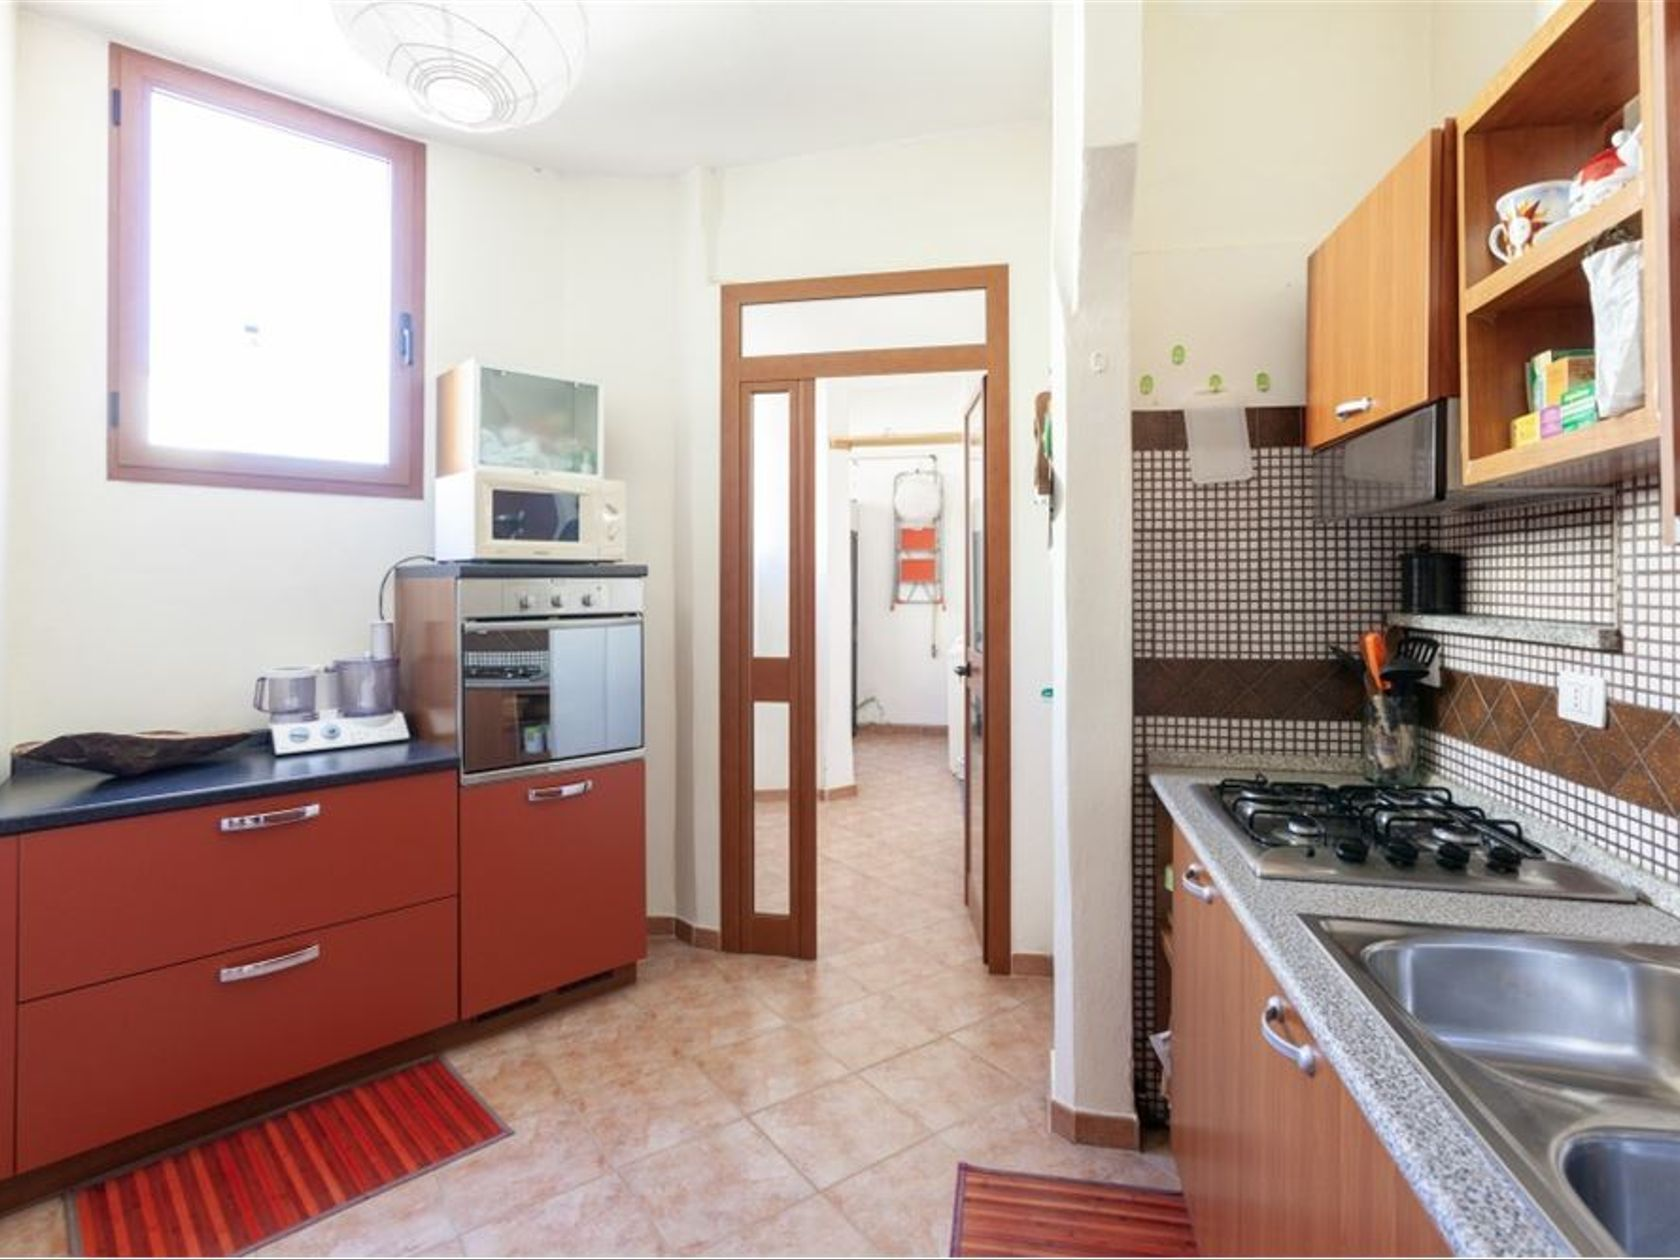 Appartamento Zona Centro, Quartu Sant'Elena, CA Vendita - Foto 4